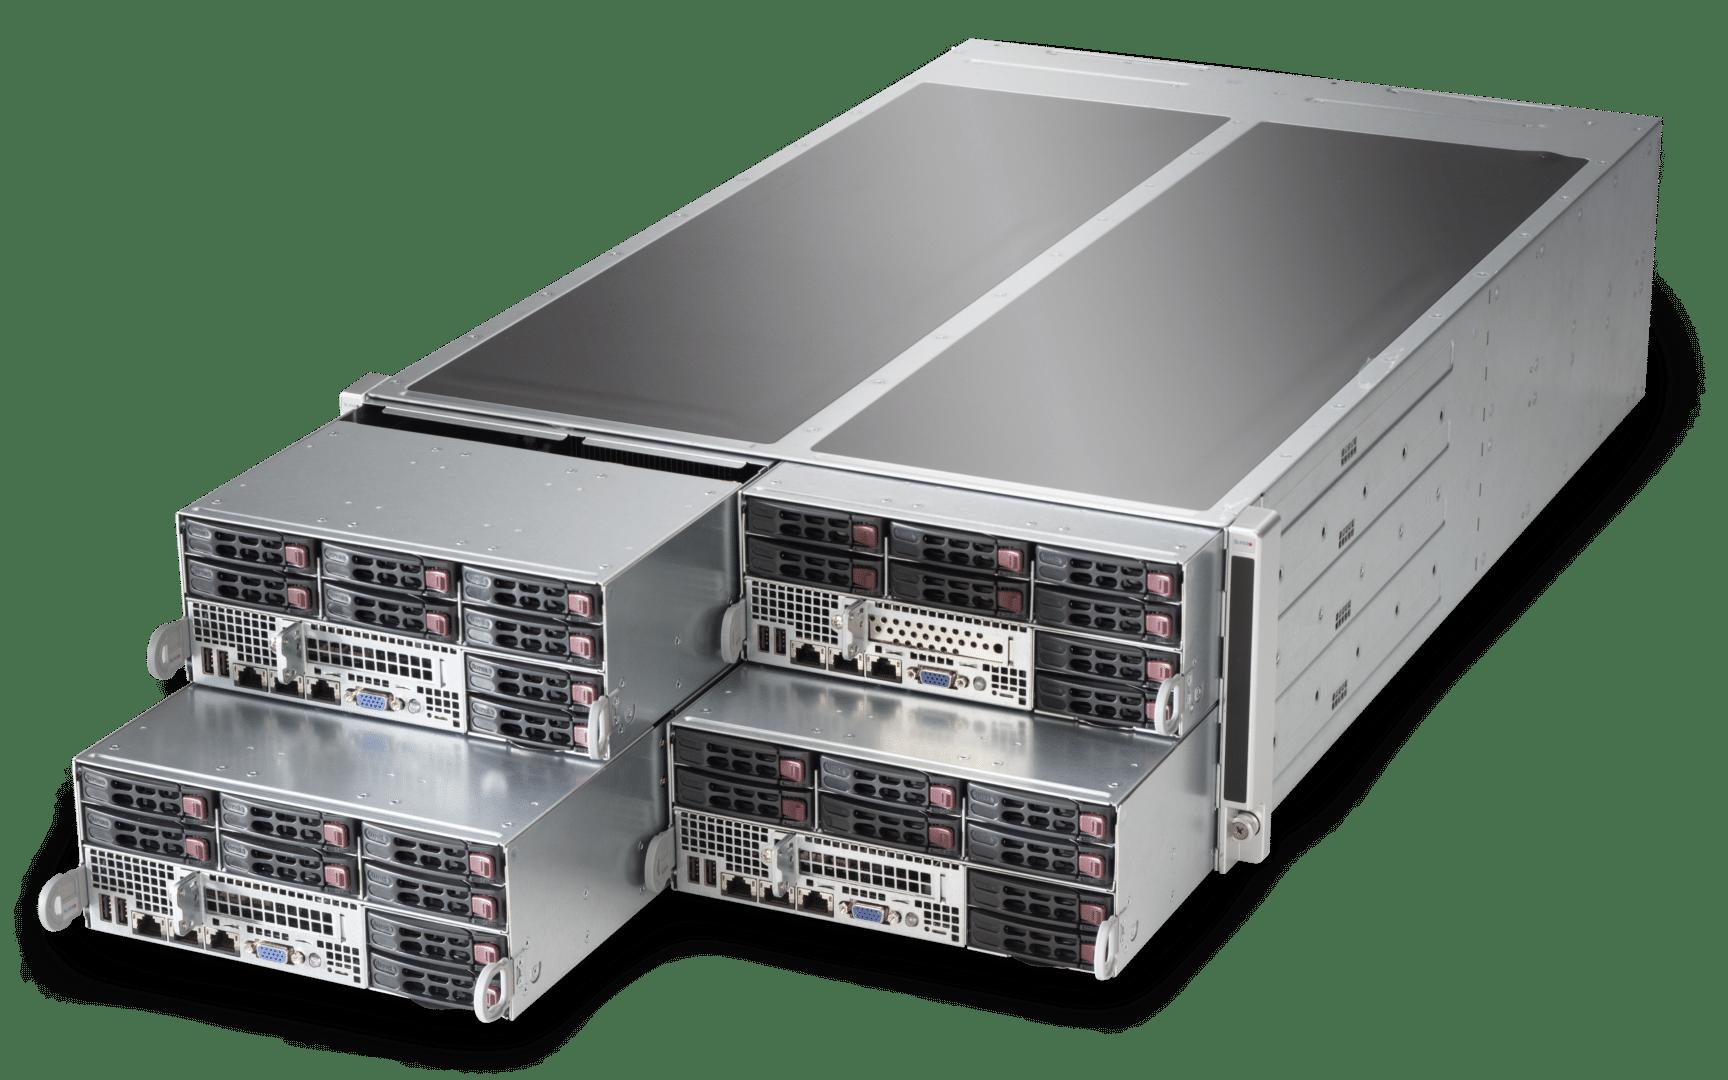 Twin Solutions - Highest Performance-per-Watt/per-Dollar